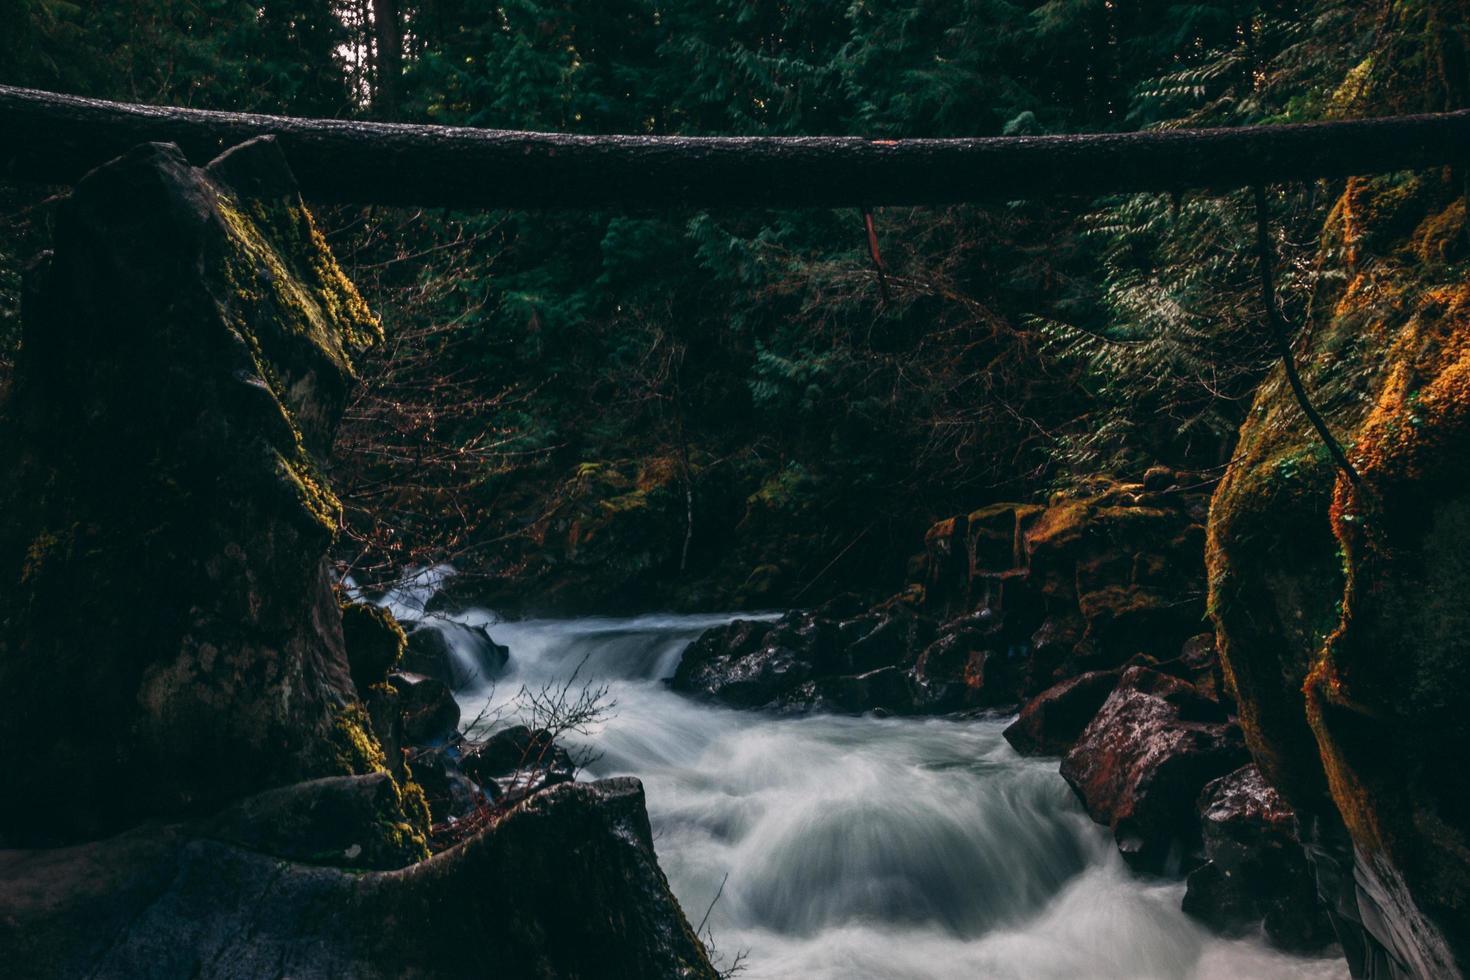 Scenery of water falls photo